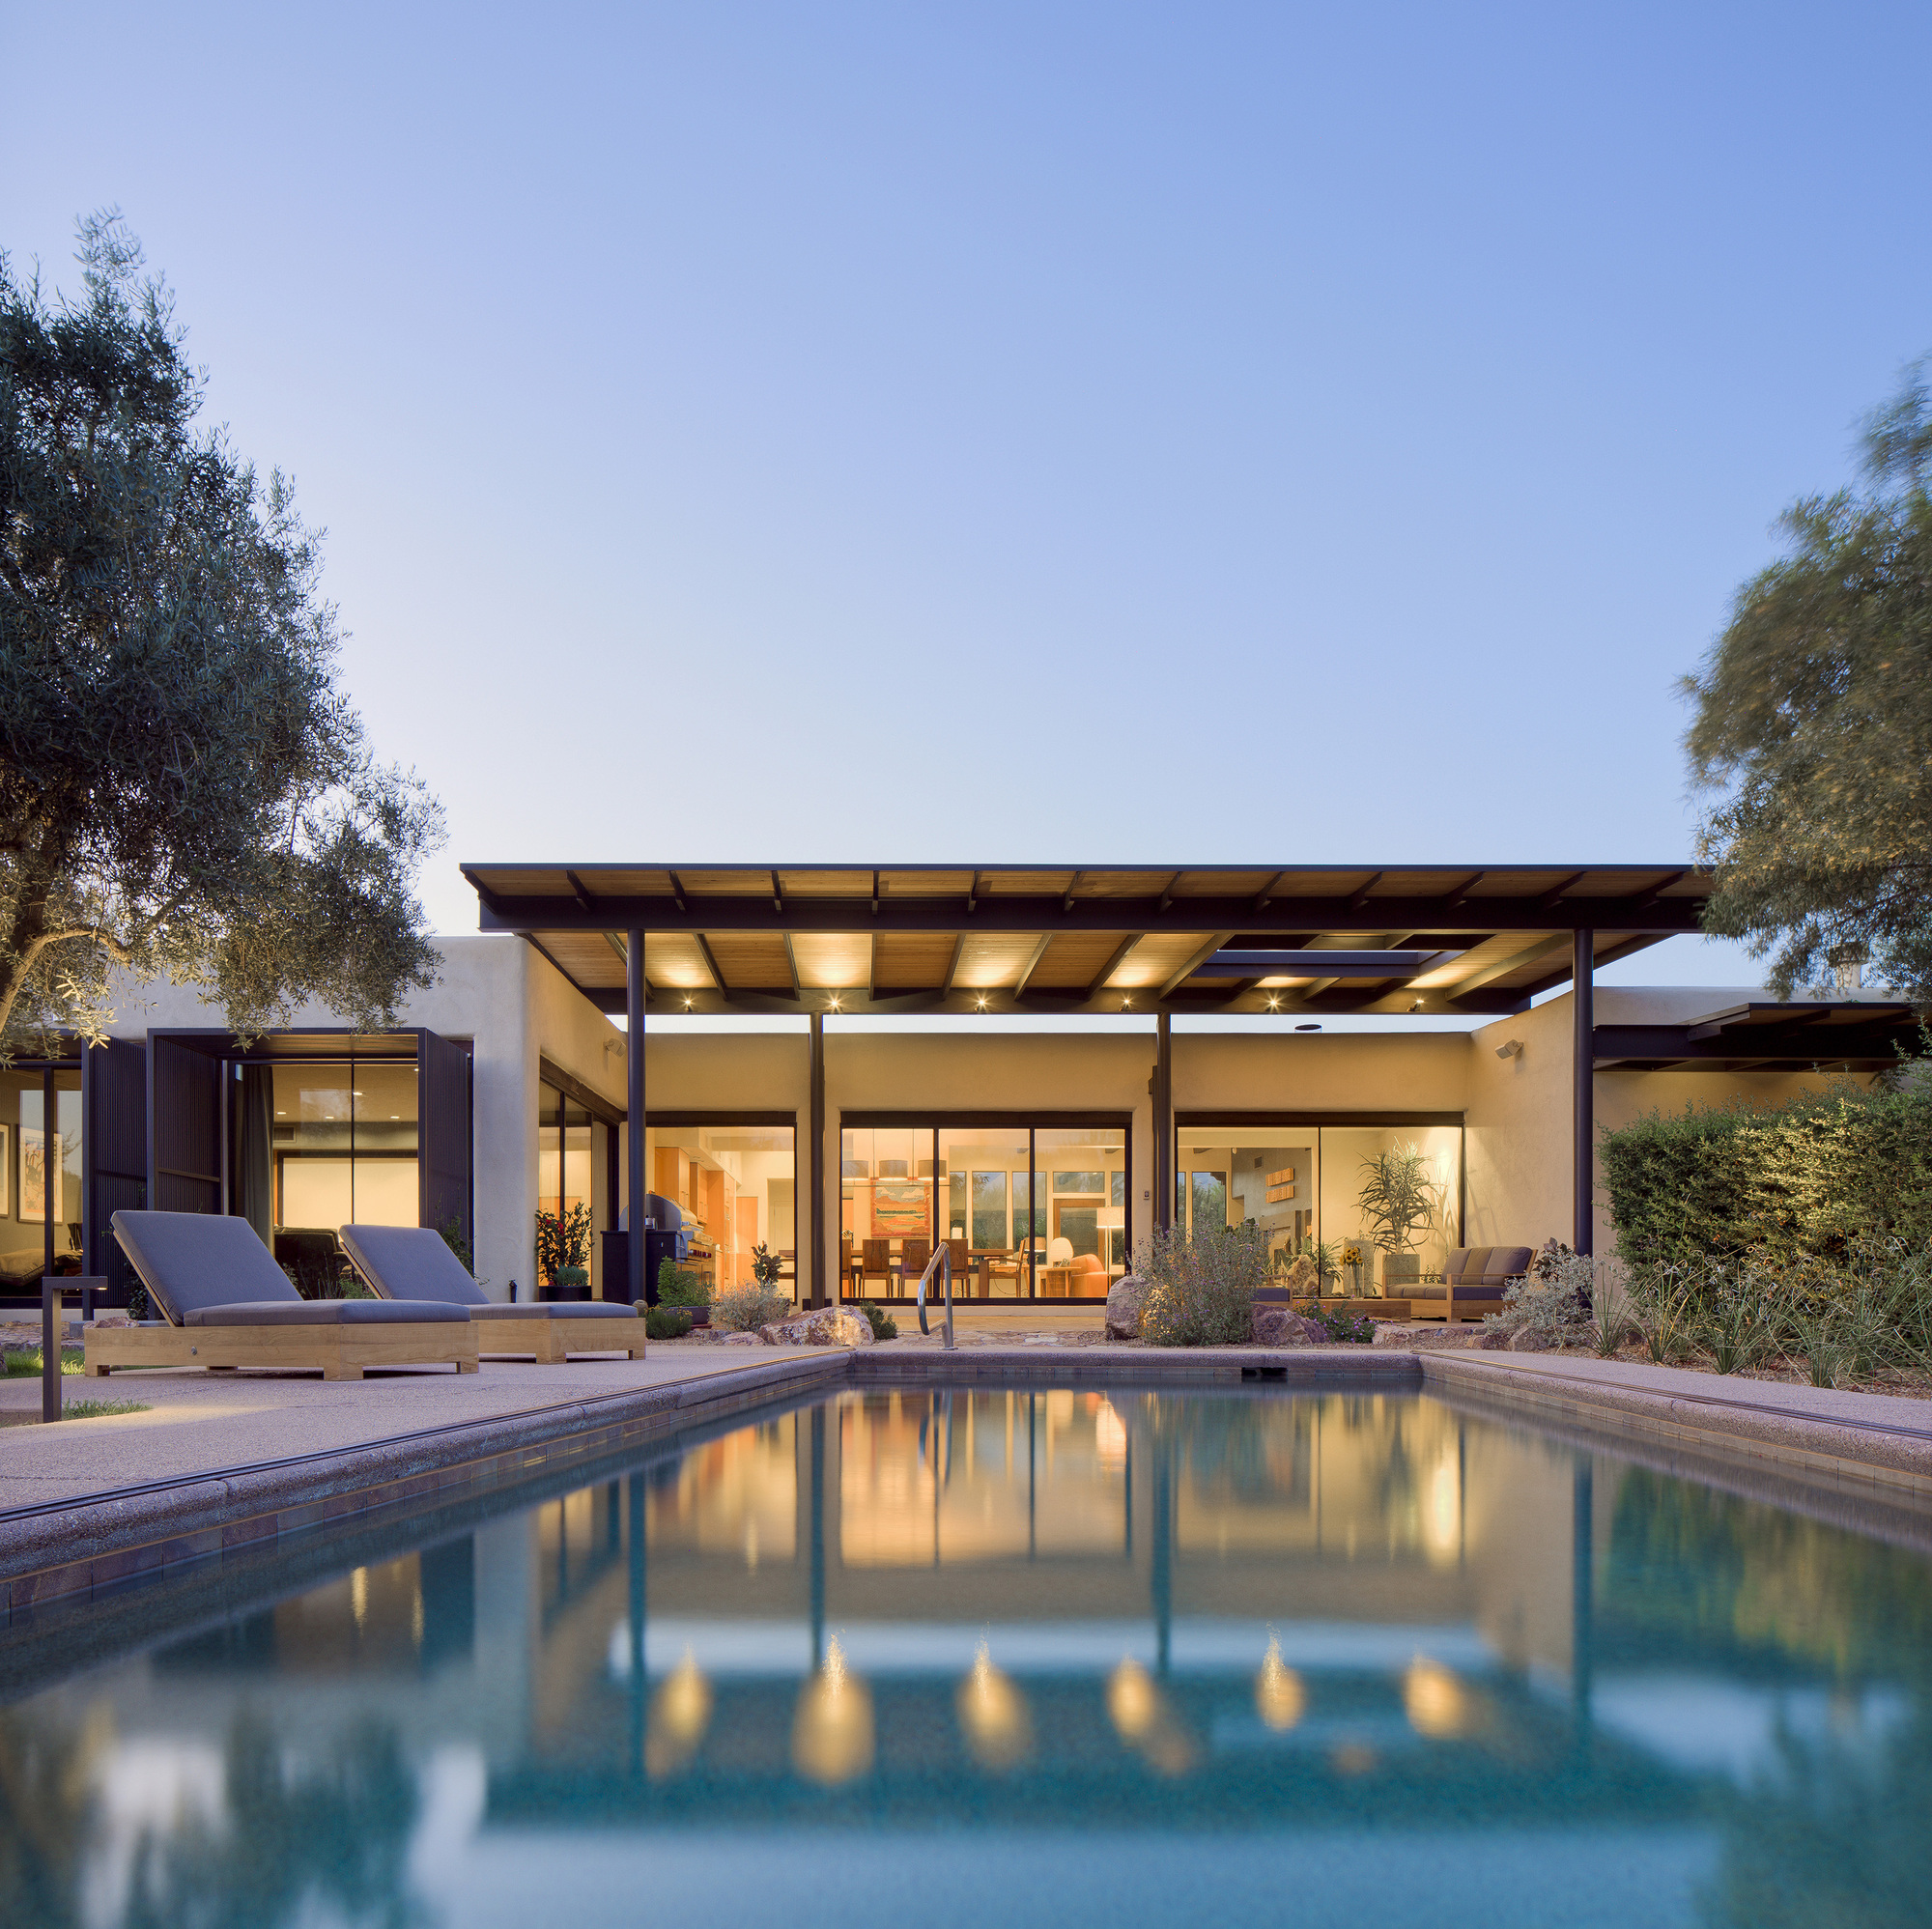 Canopy House / Rob Paulus Architects